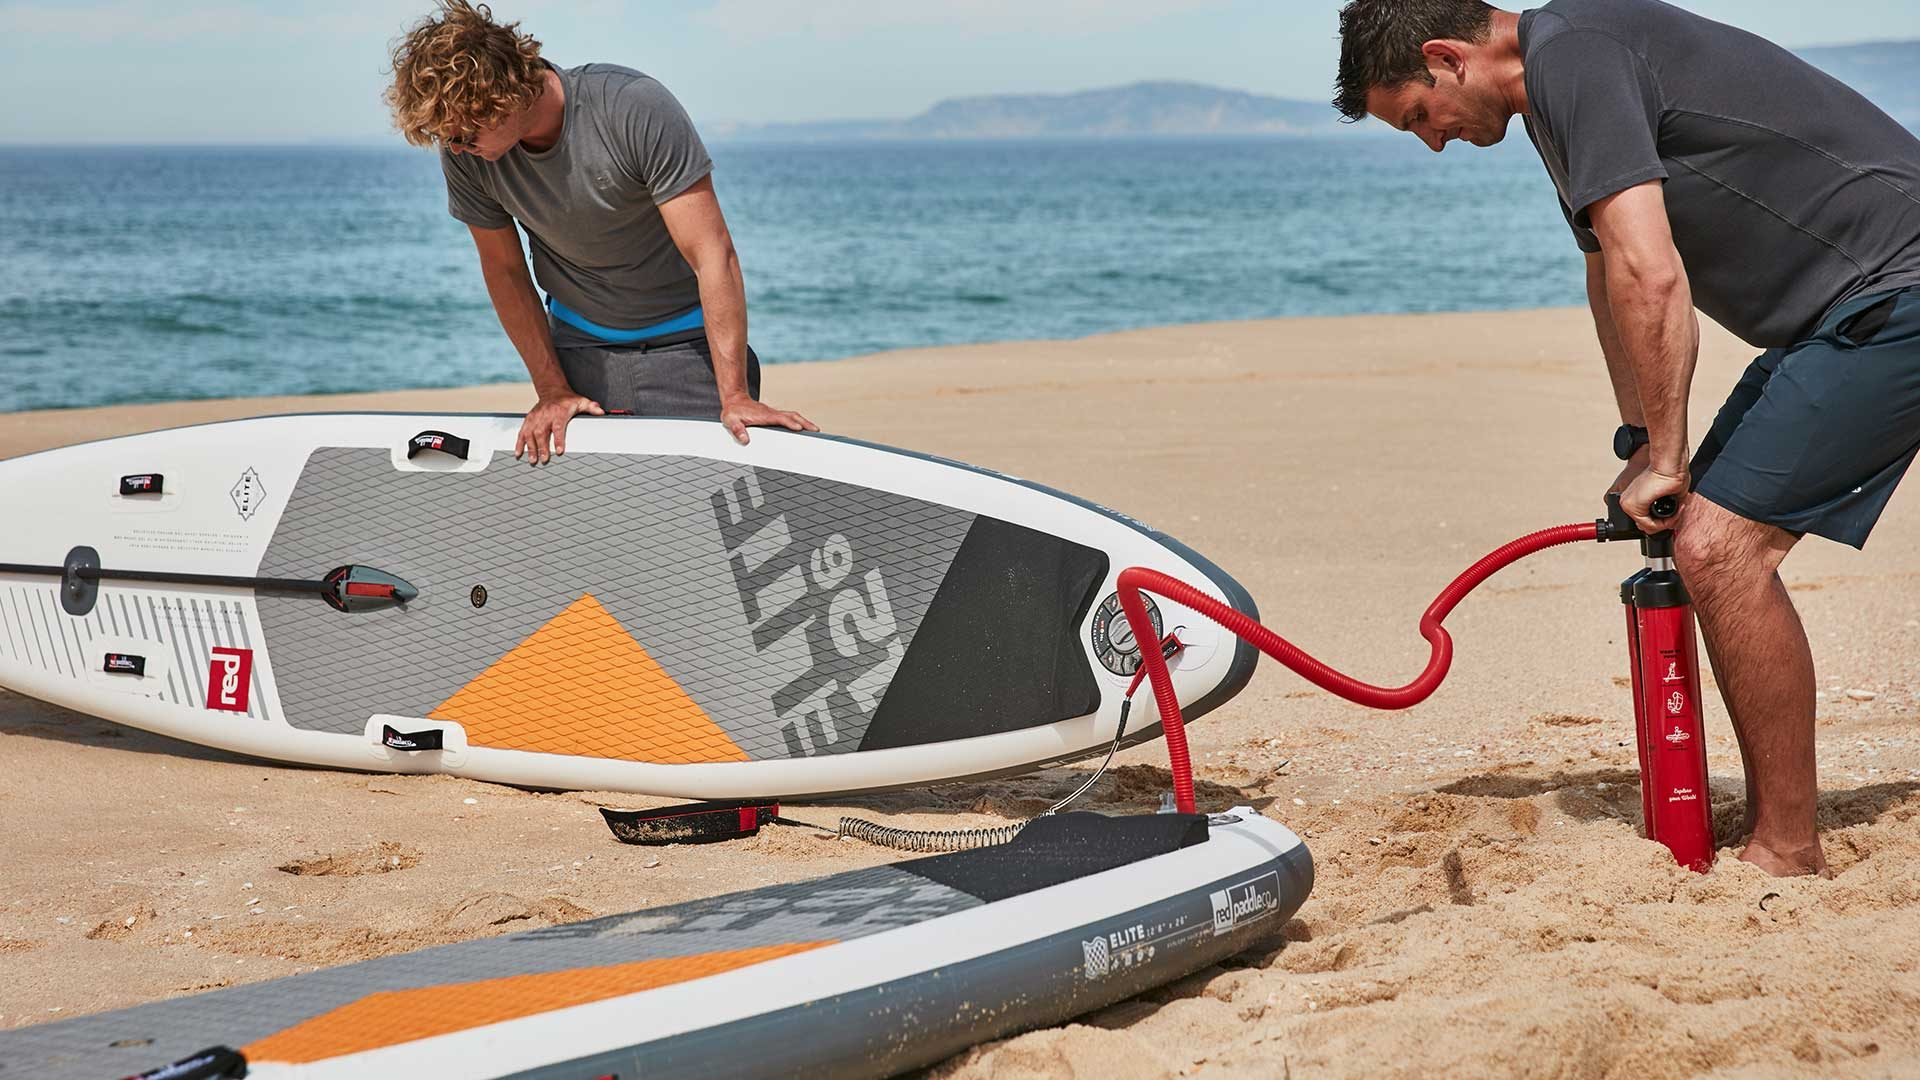 redpaddleco-126-x-26-elite-inflatable-paddle-board-desktop-gallery-deckpad